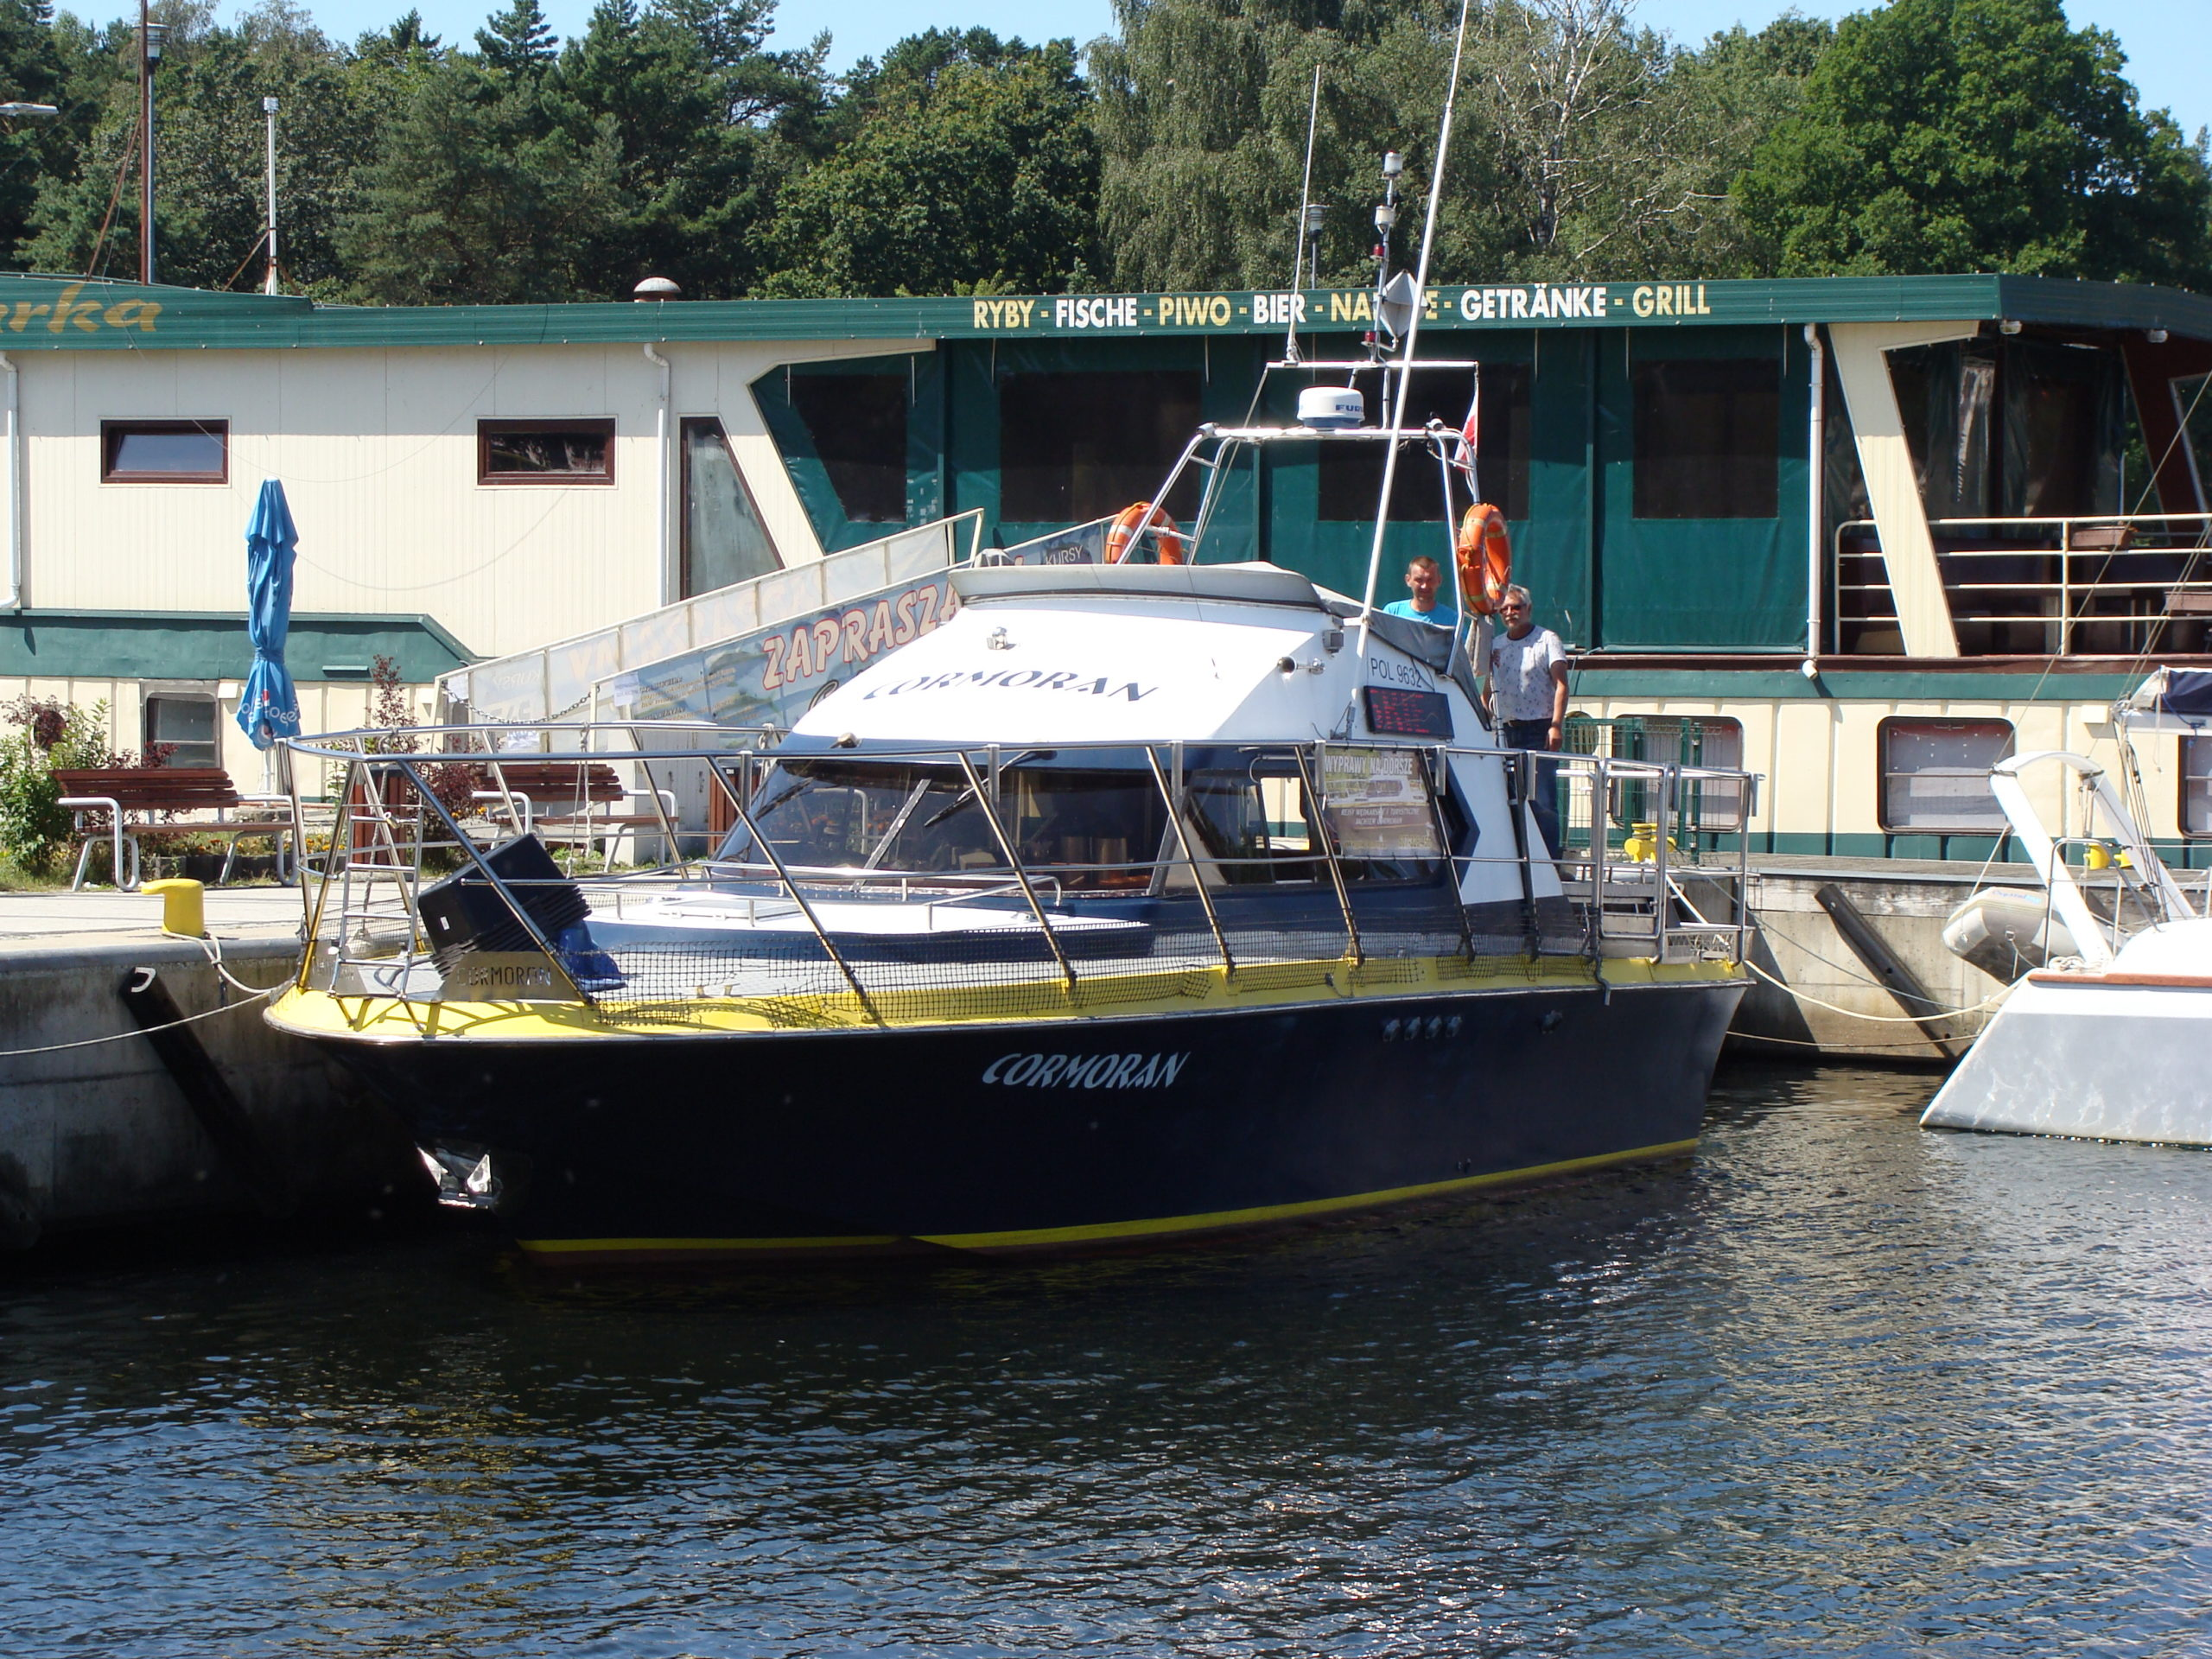 Jacht motorowy 4